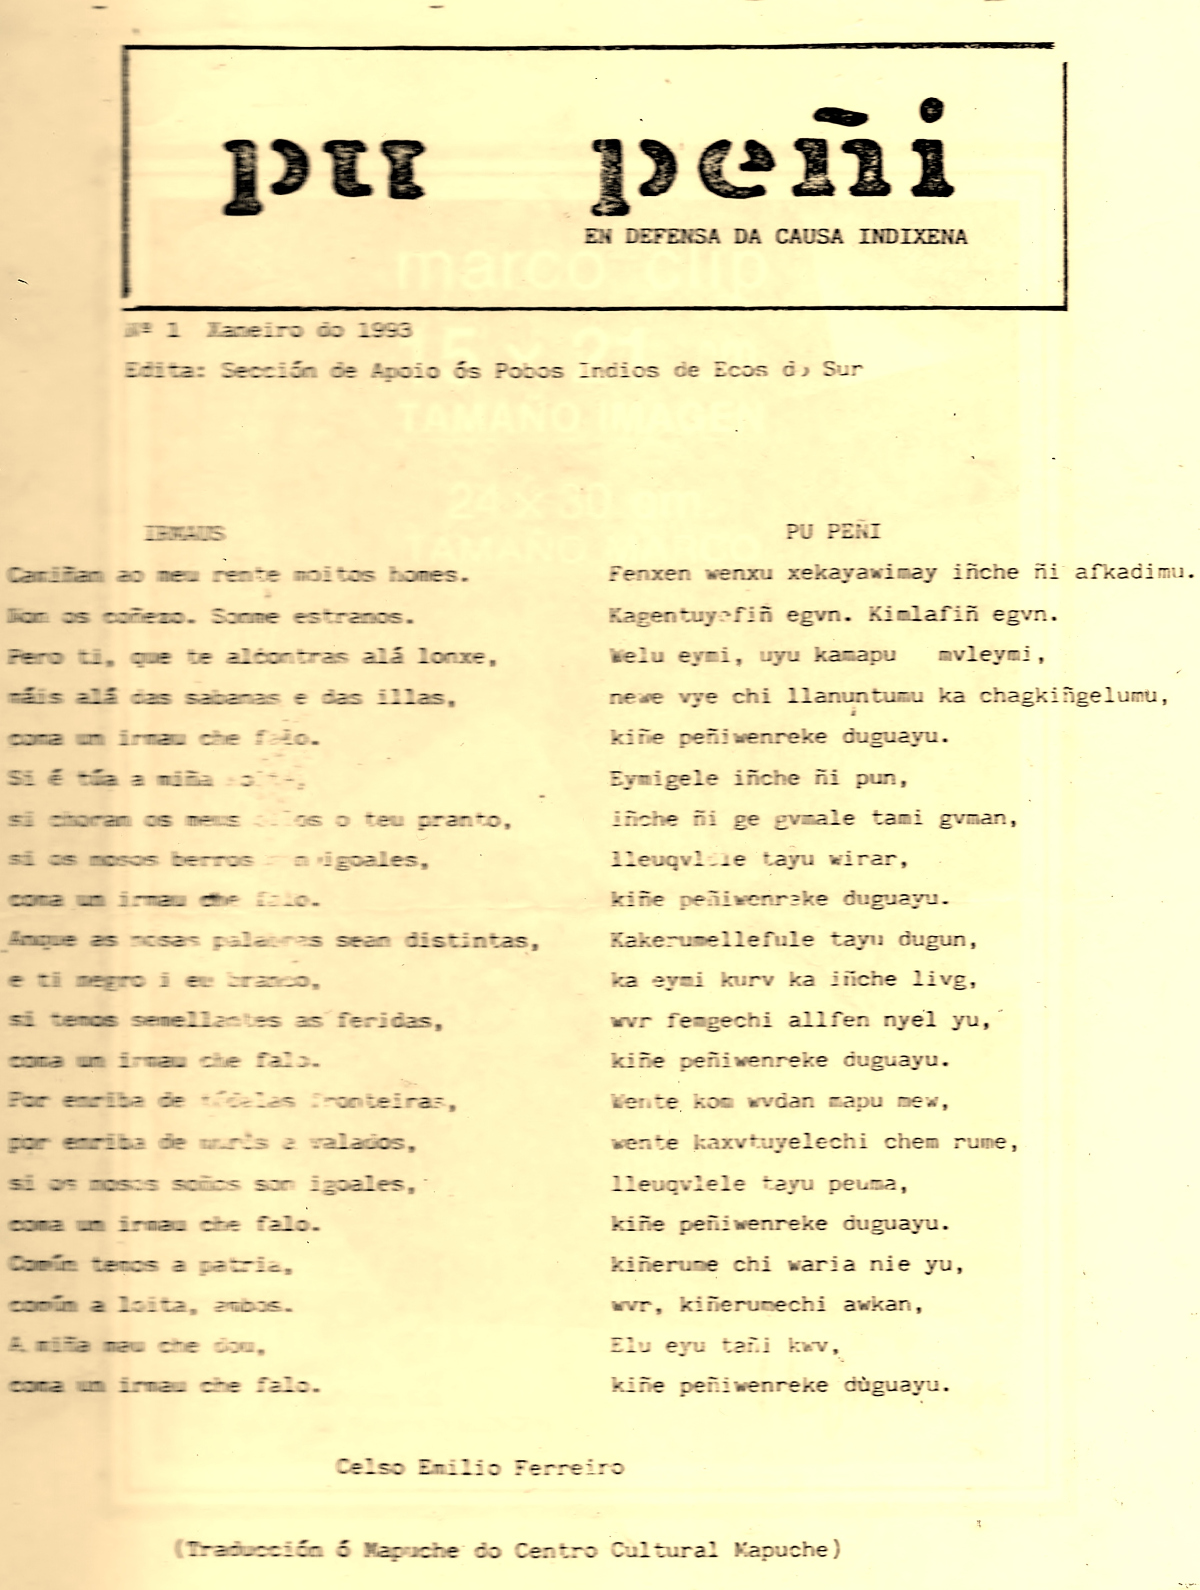 poema-irmaus-en-galego-e-mapuche1